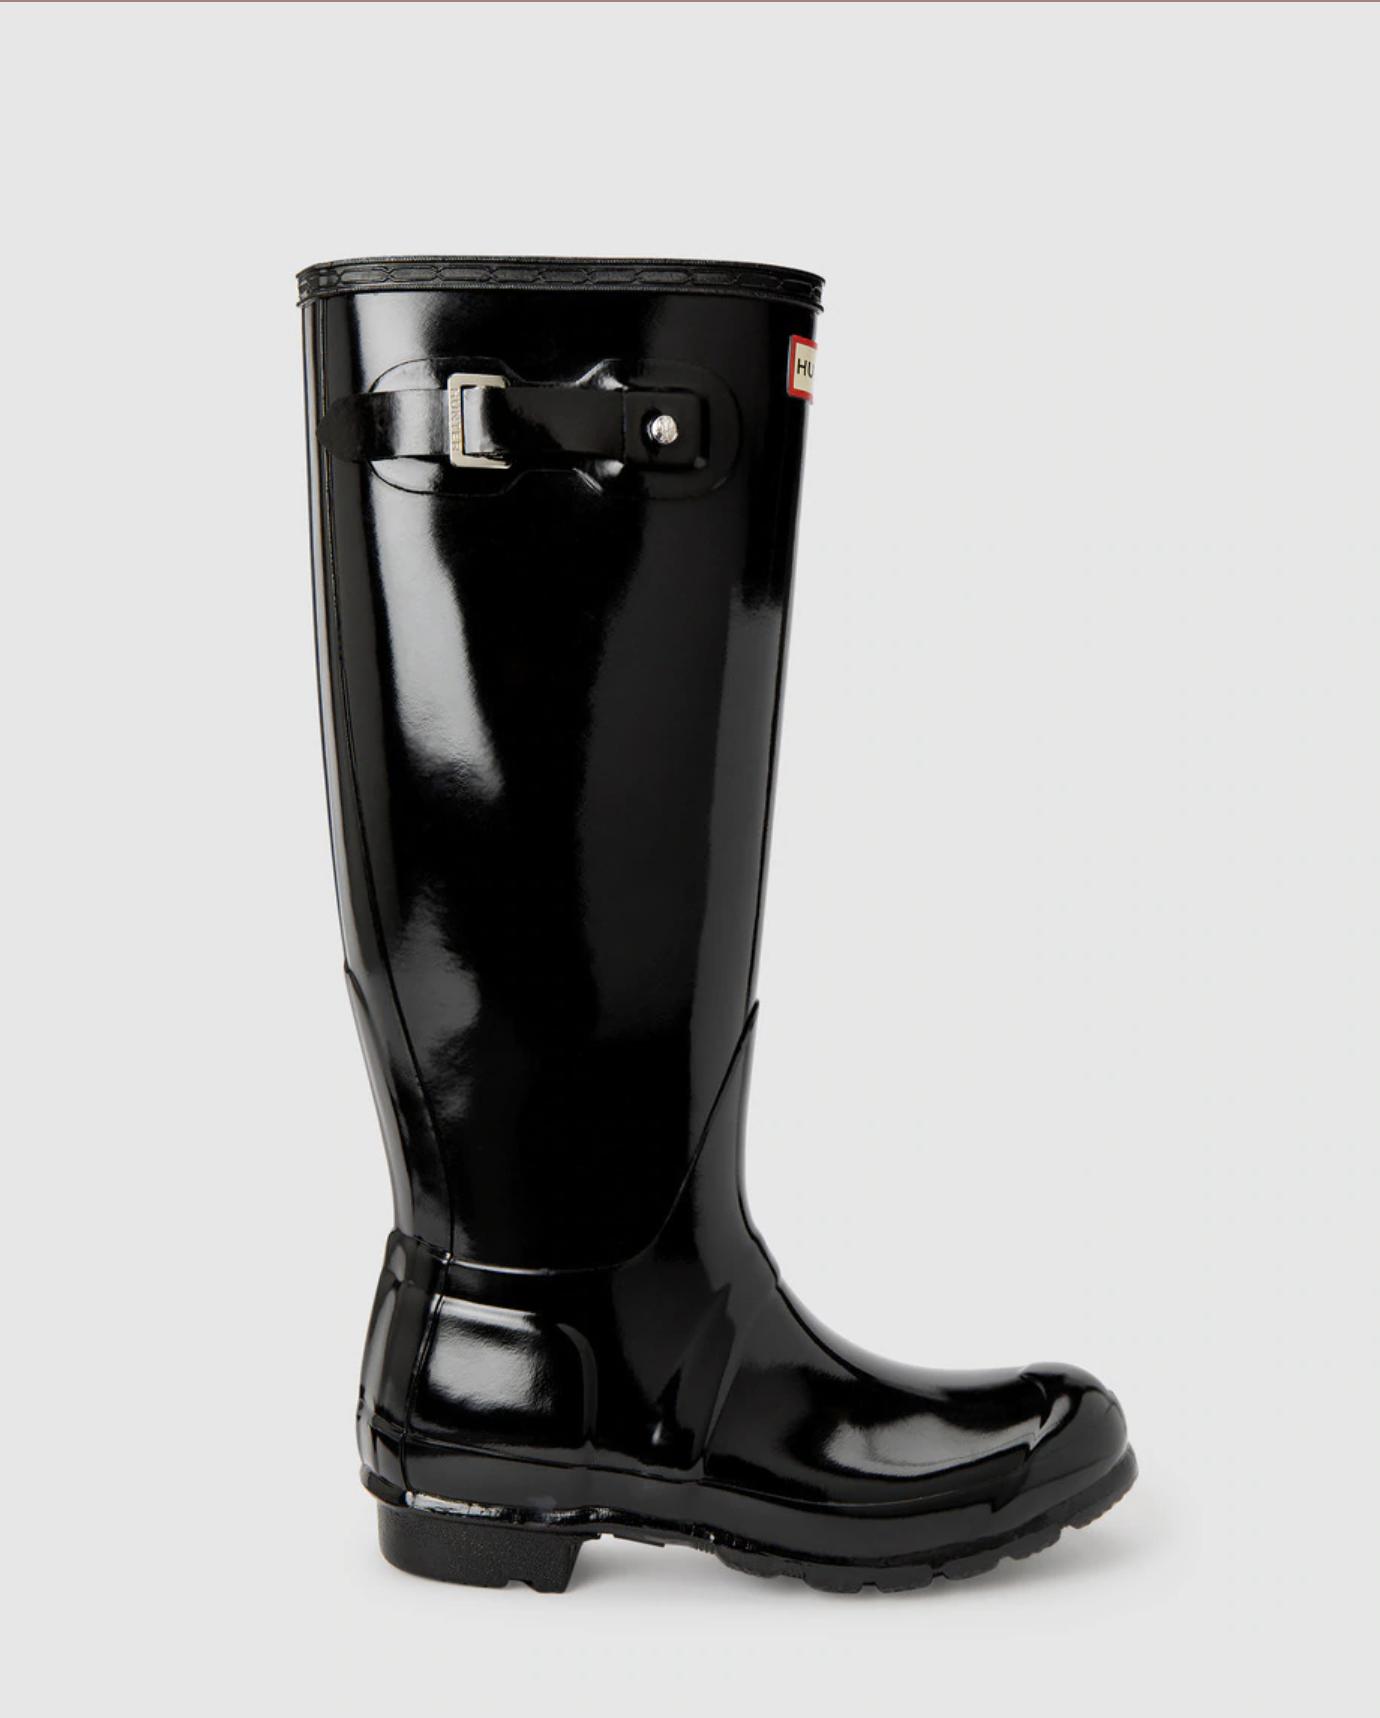 Botas de agua de mujer Hunter de color negro con acabado gloss